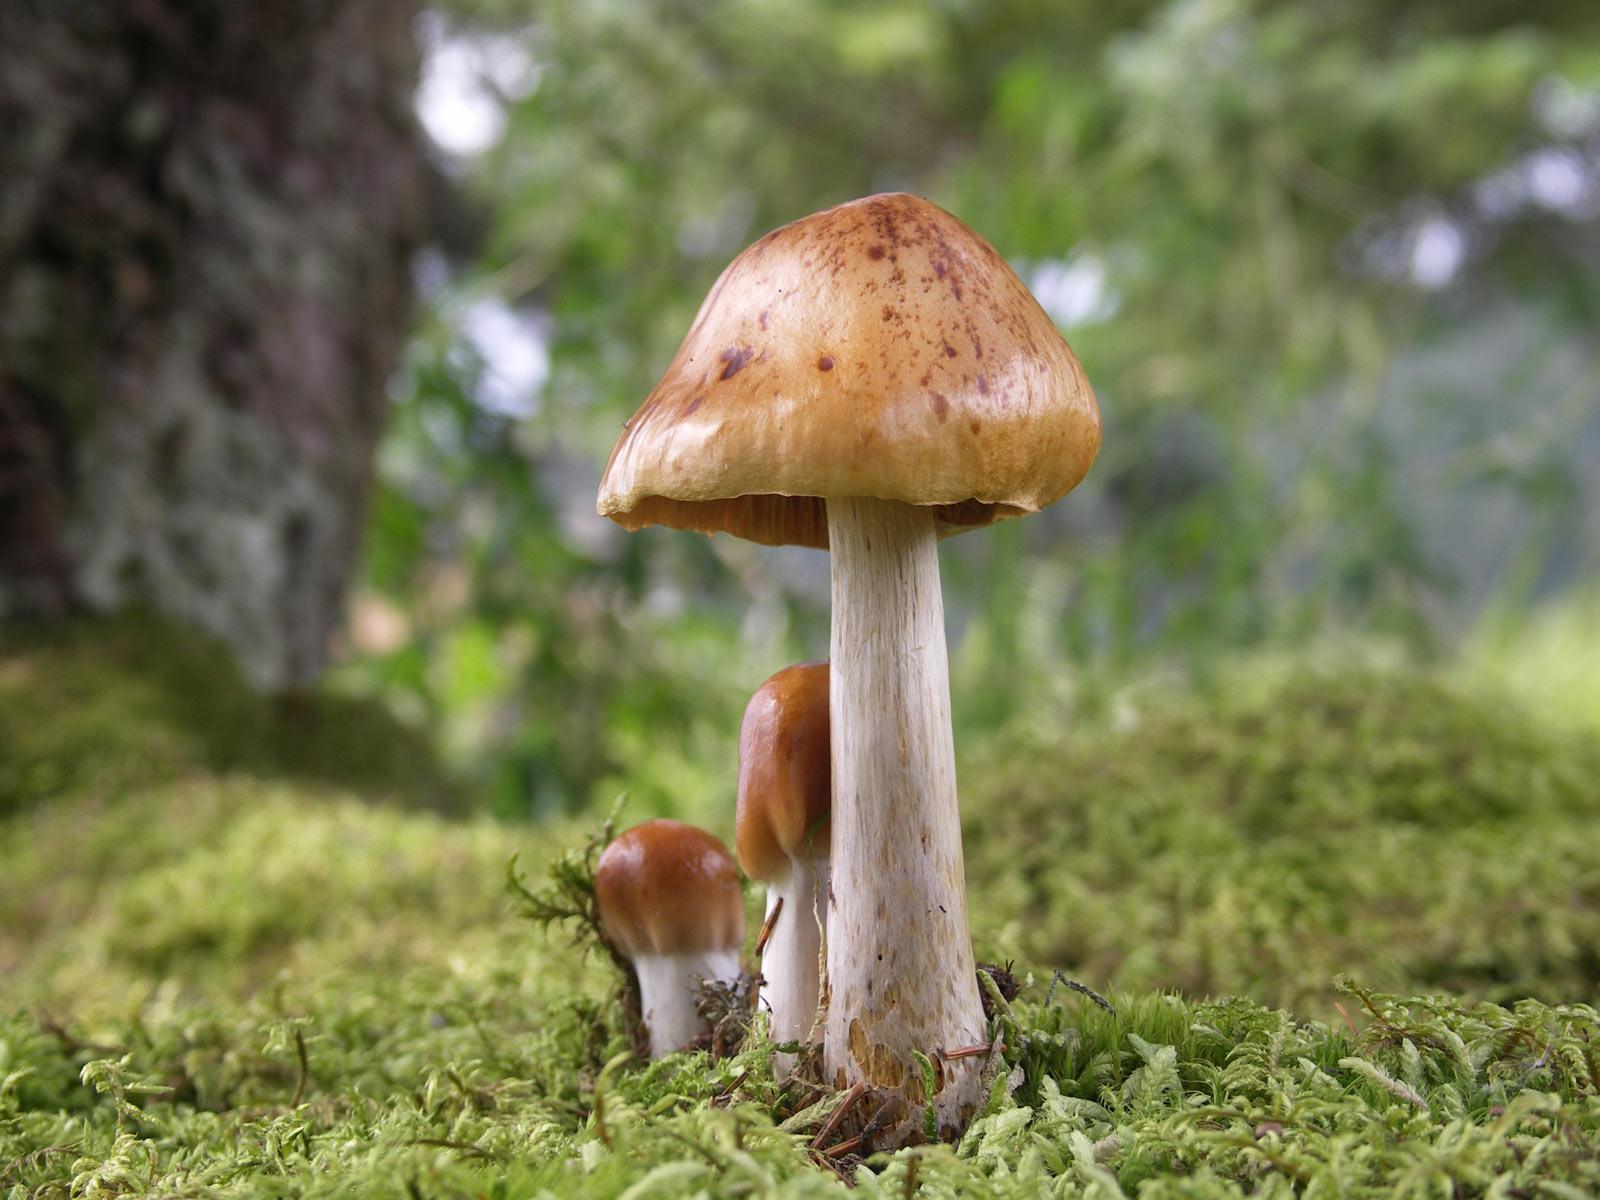 Desktop Wallpaper · Gallery · Nature Wood Mushroom